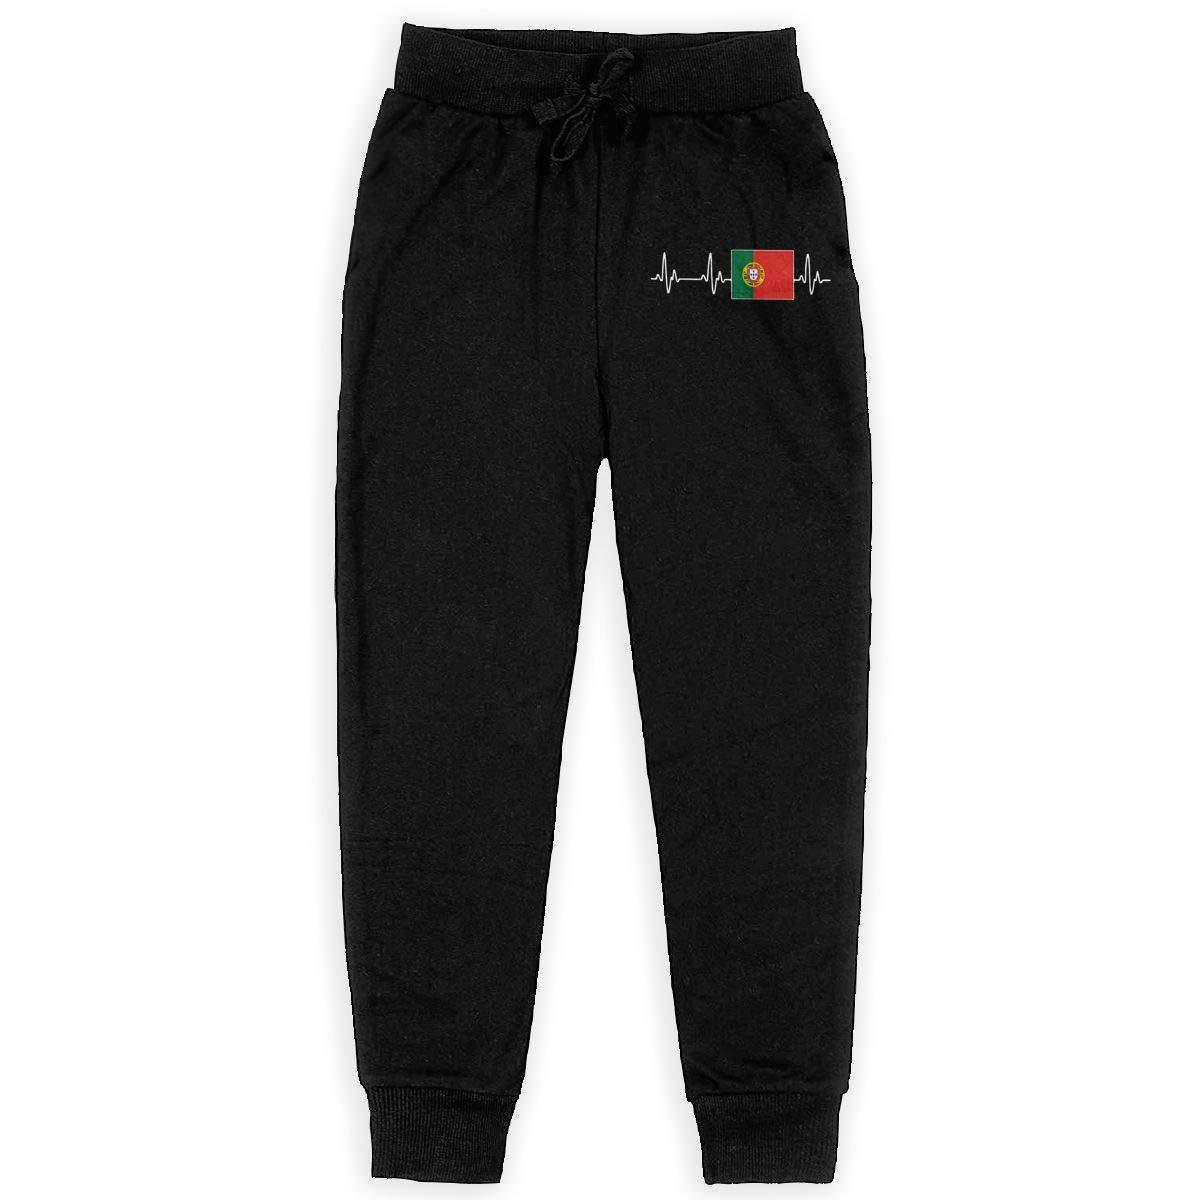 WYZVK22 Portugal Heartbeat-1 Soft//Cozy Sweatpants Youth Active Basic Jogger Fleece Pants Teen Boy